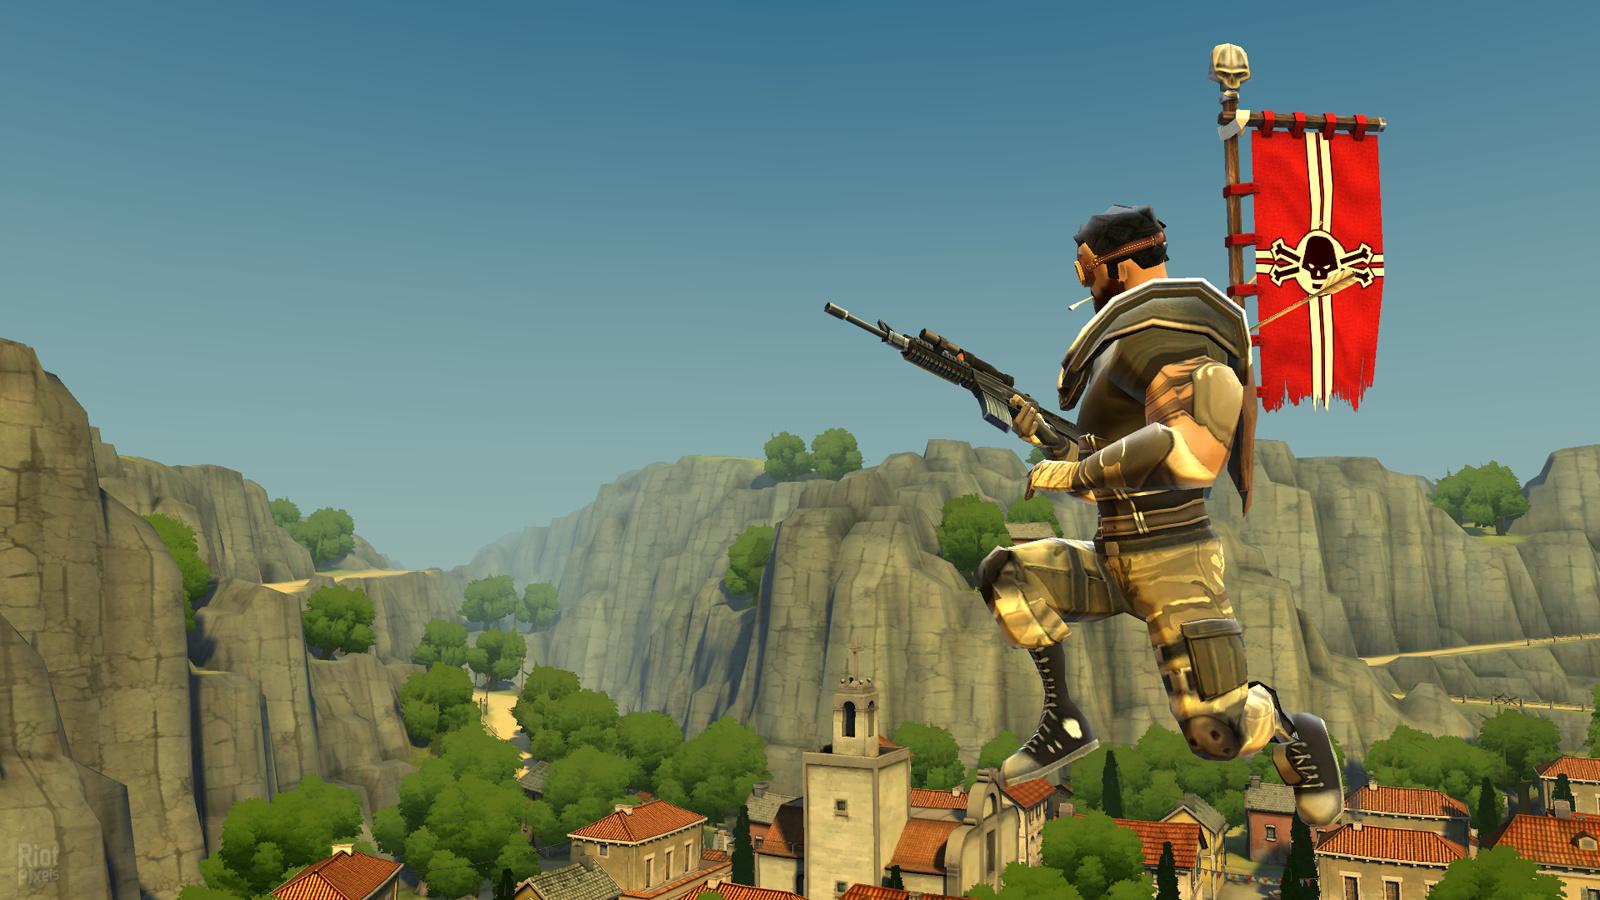 Battlefield Heroes Game Screenshots At Riot Pixels Images